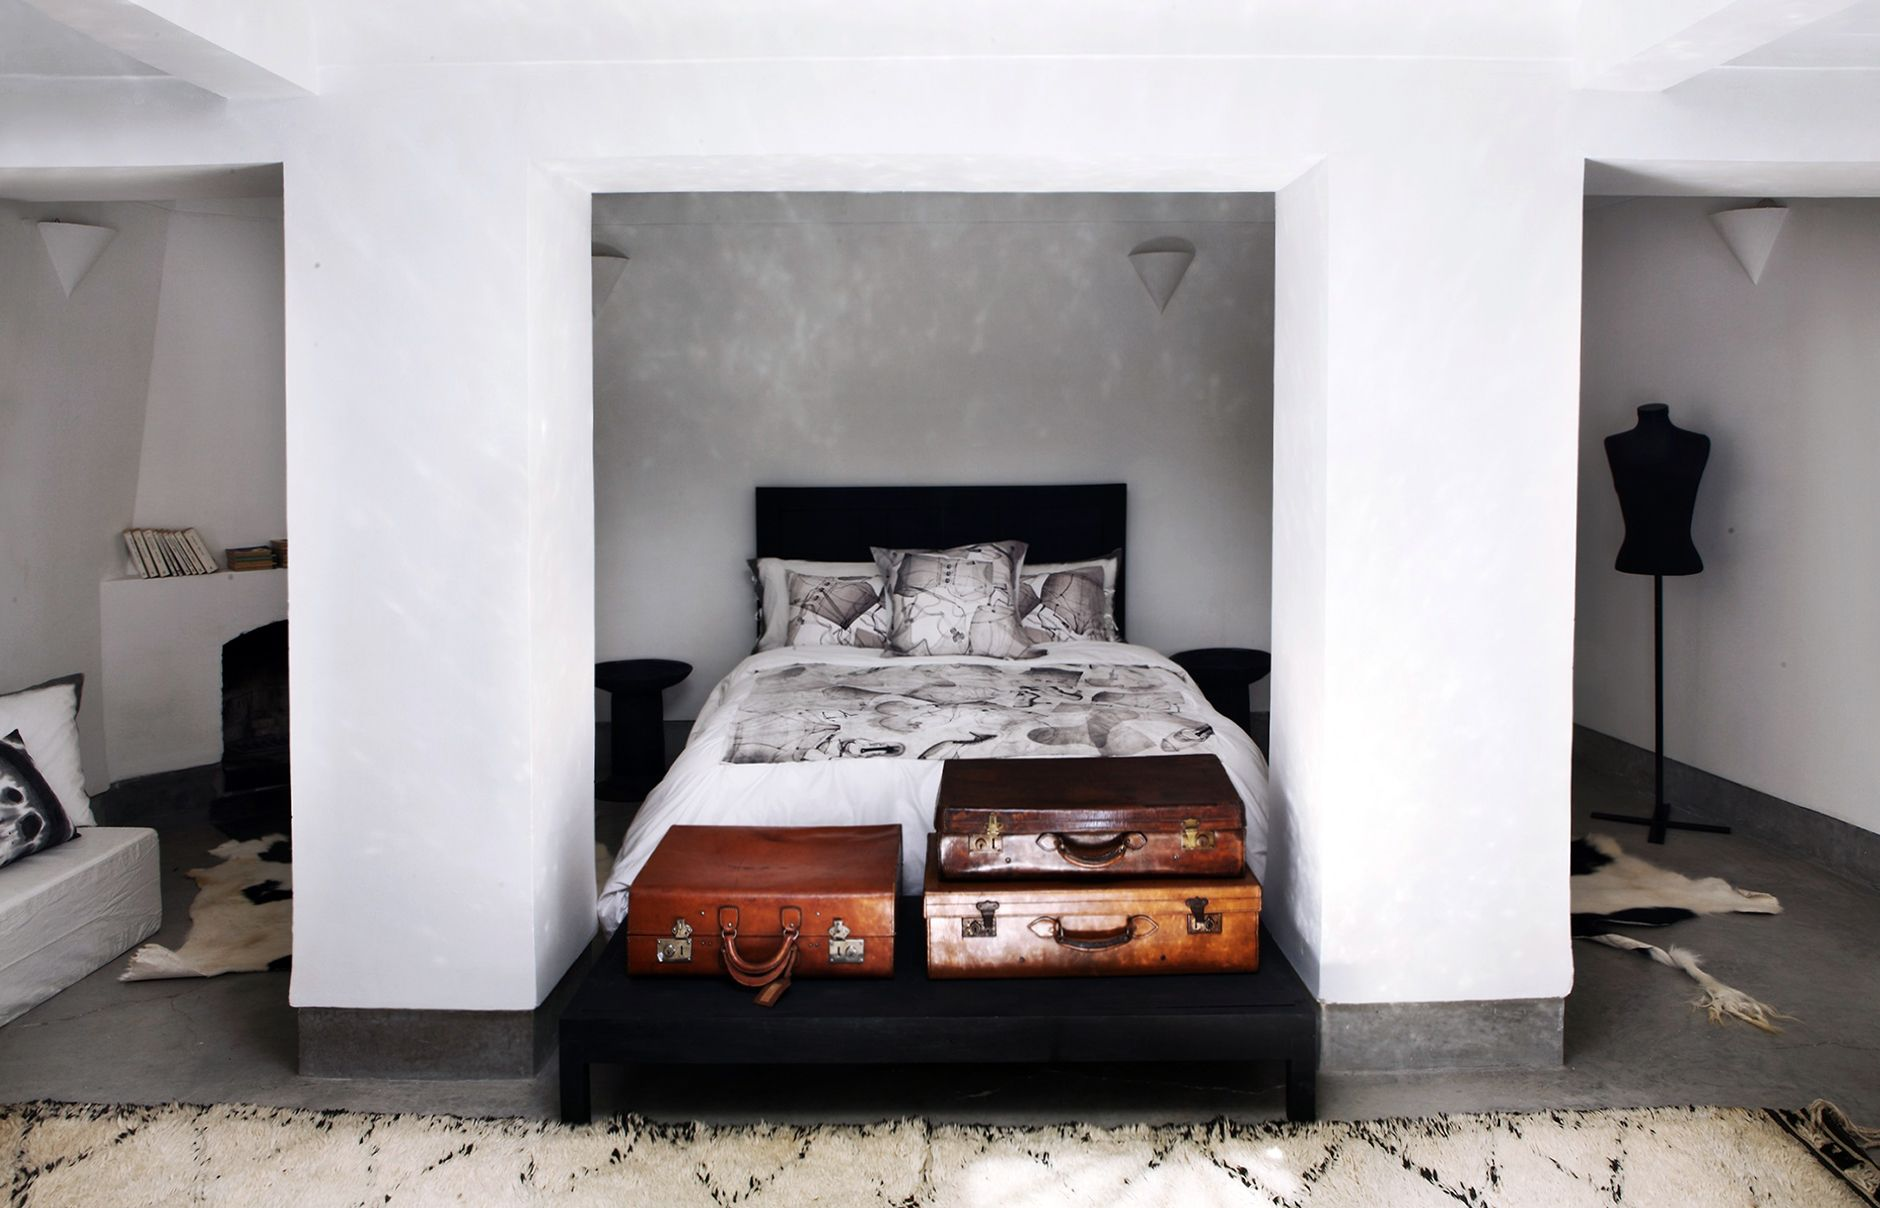 Tranquil by design: Dar Kawa Marrakech | Luxury Hotels TravelPlusStyle